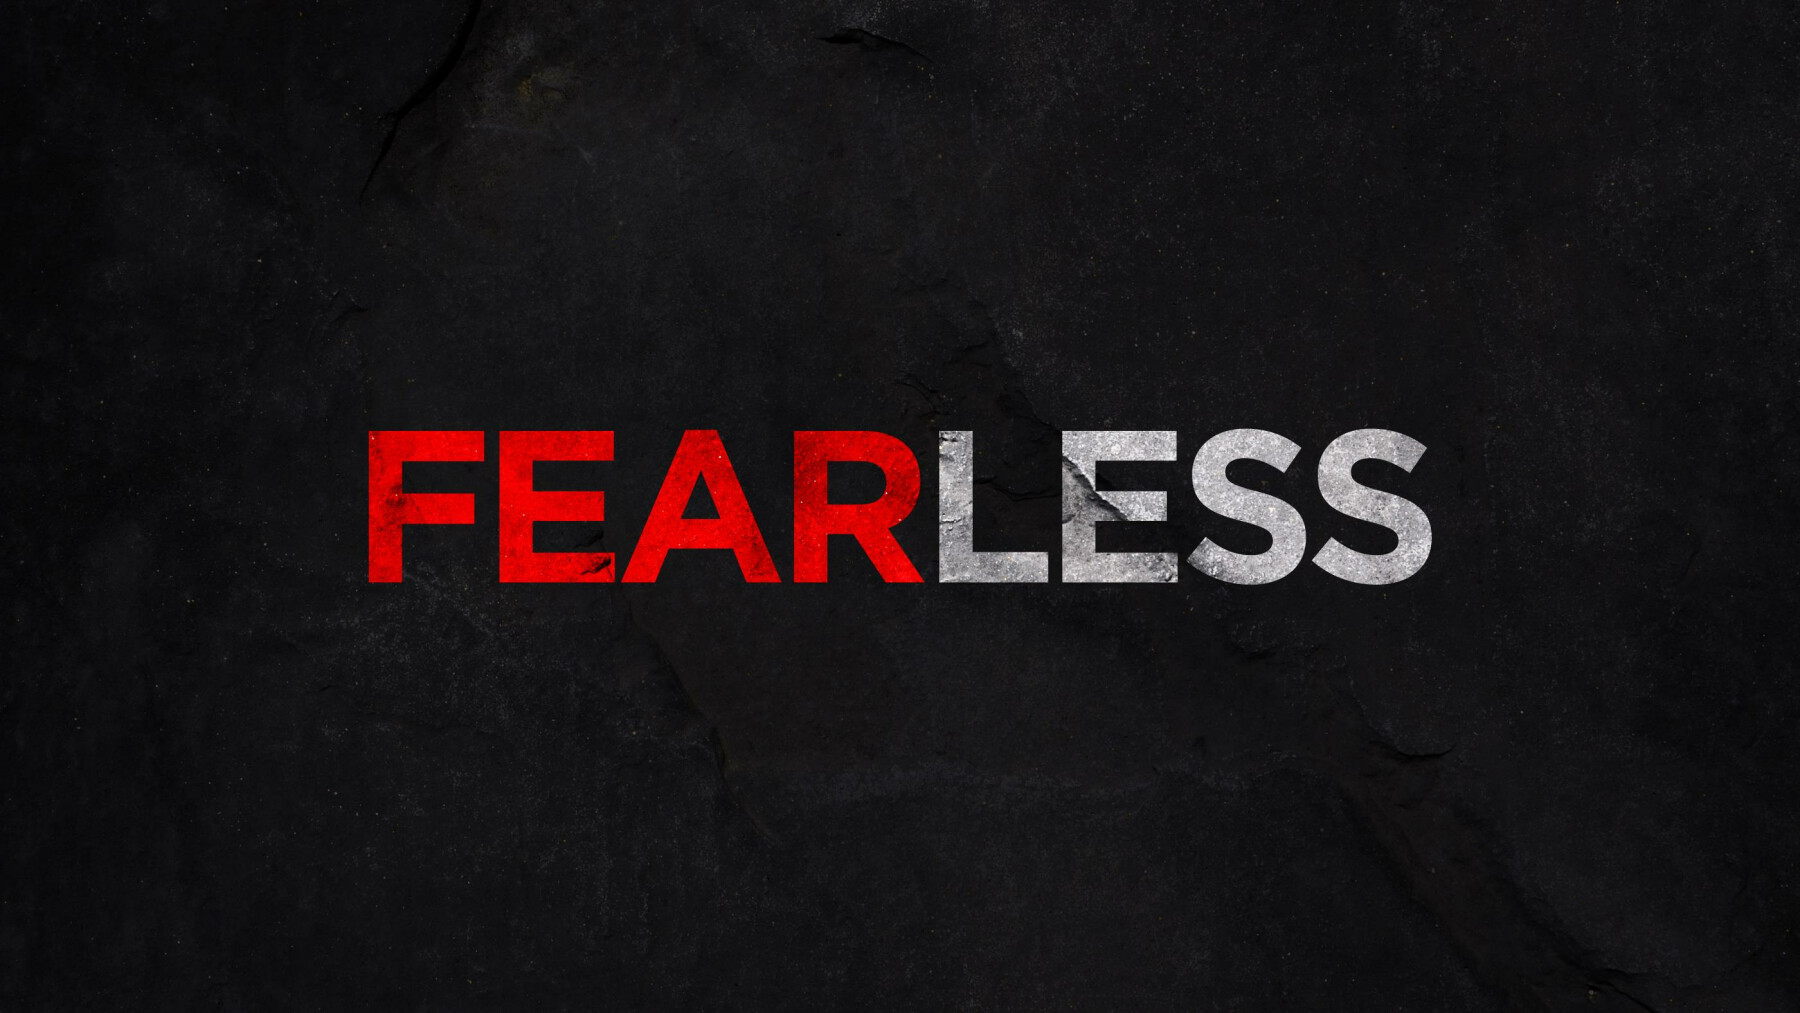 FEARLESS DNOW 2019